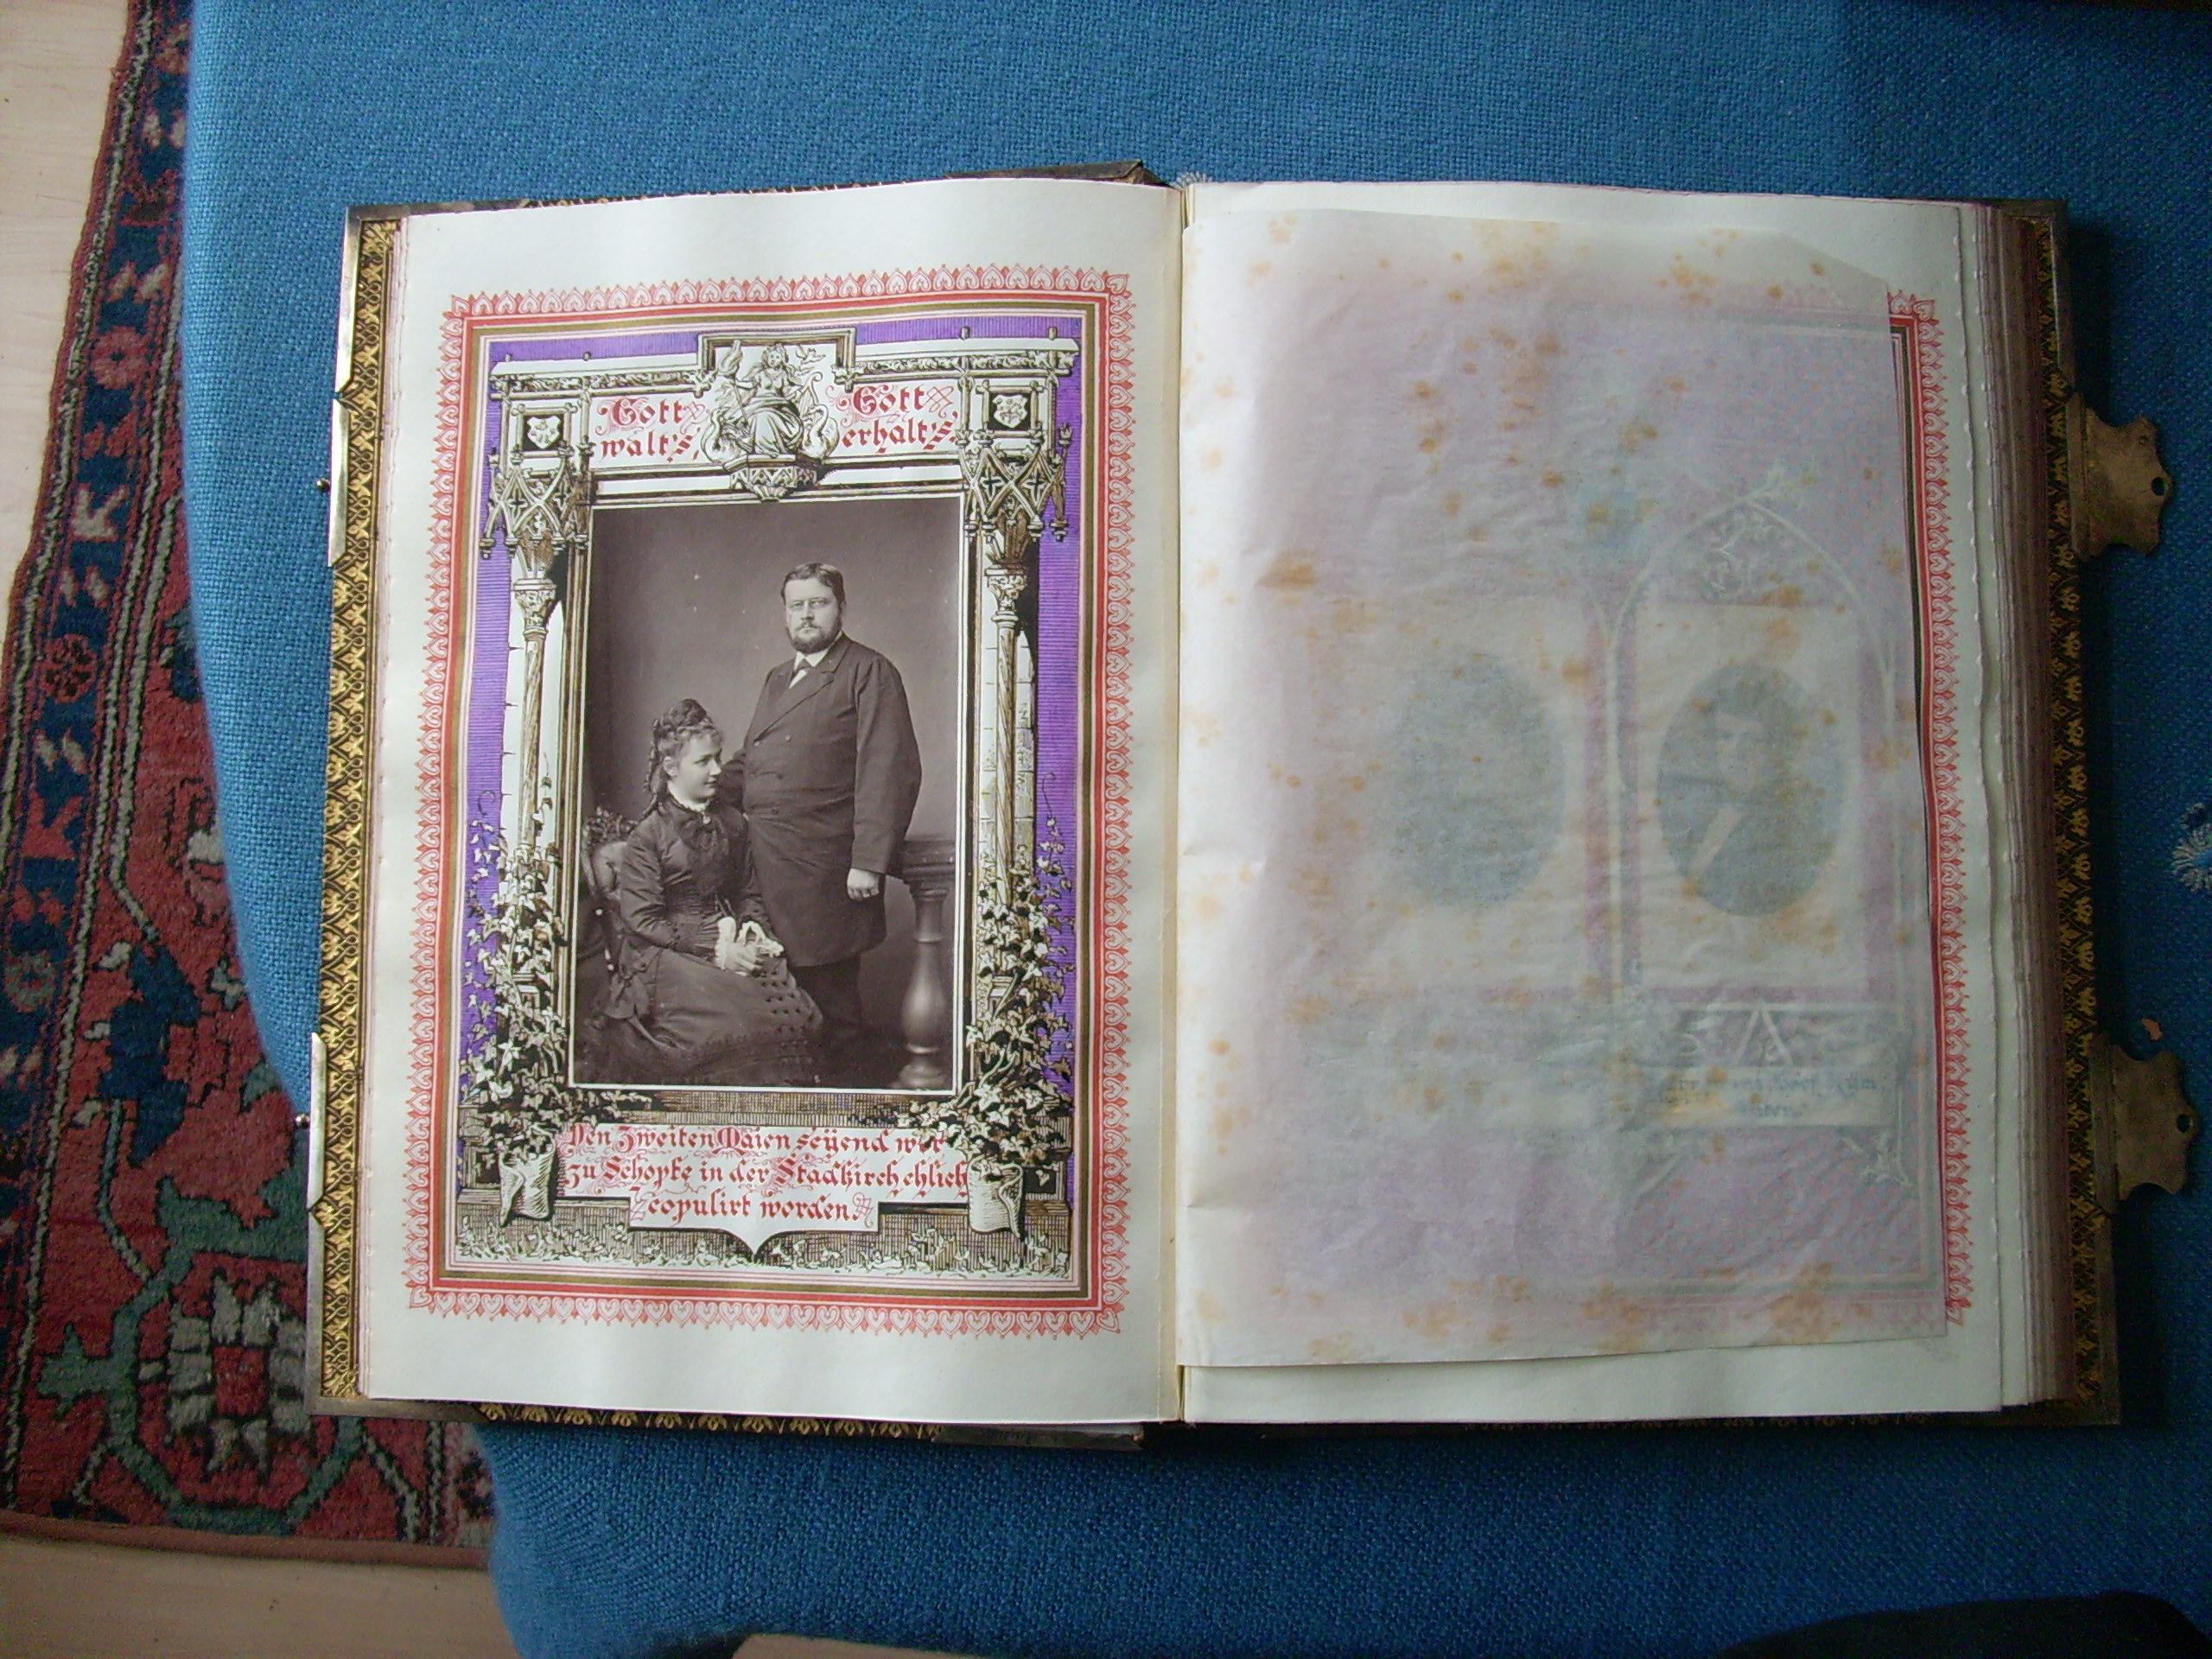 Heiratsbuch Anna Kym-Krafft mit Ehemann Camyll Kym